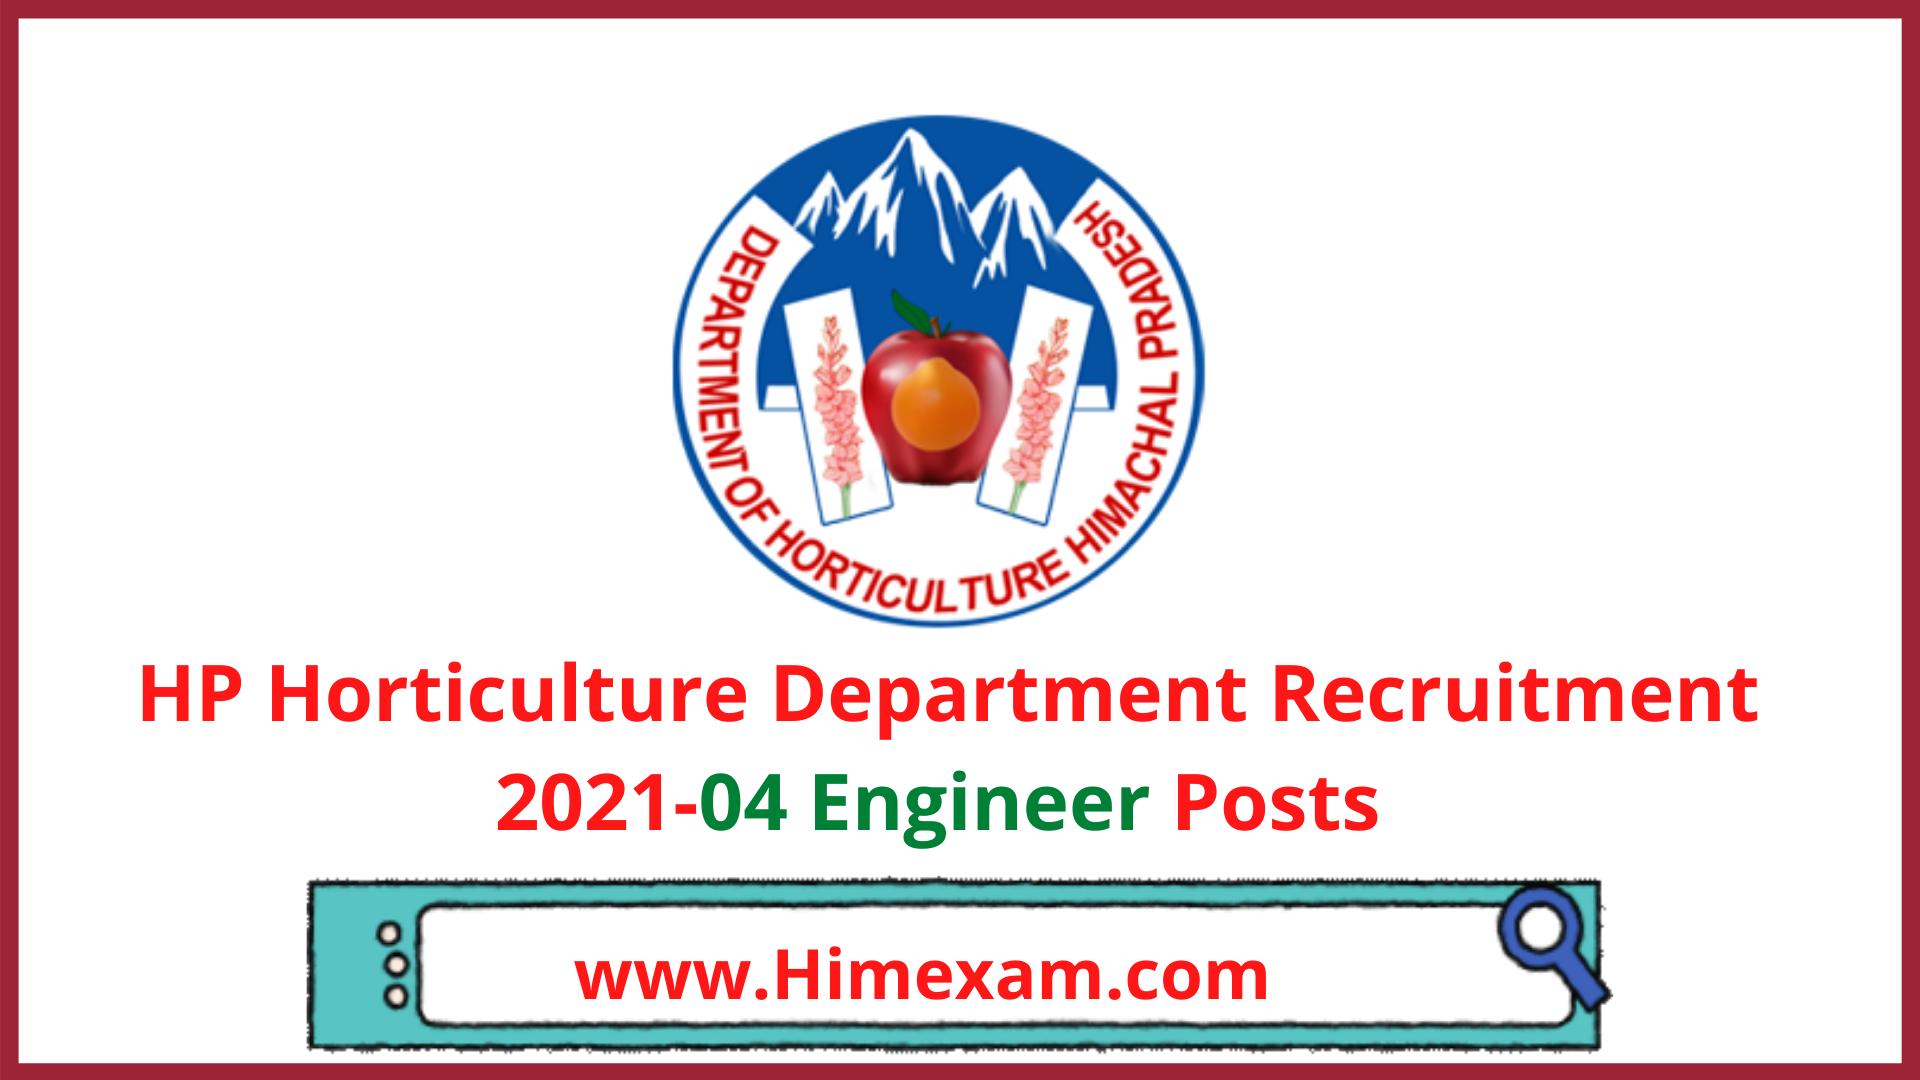 HP Horticulture Department Recruitment 2021-04 Engineer Posts